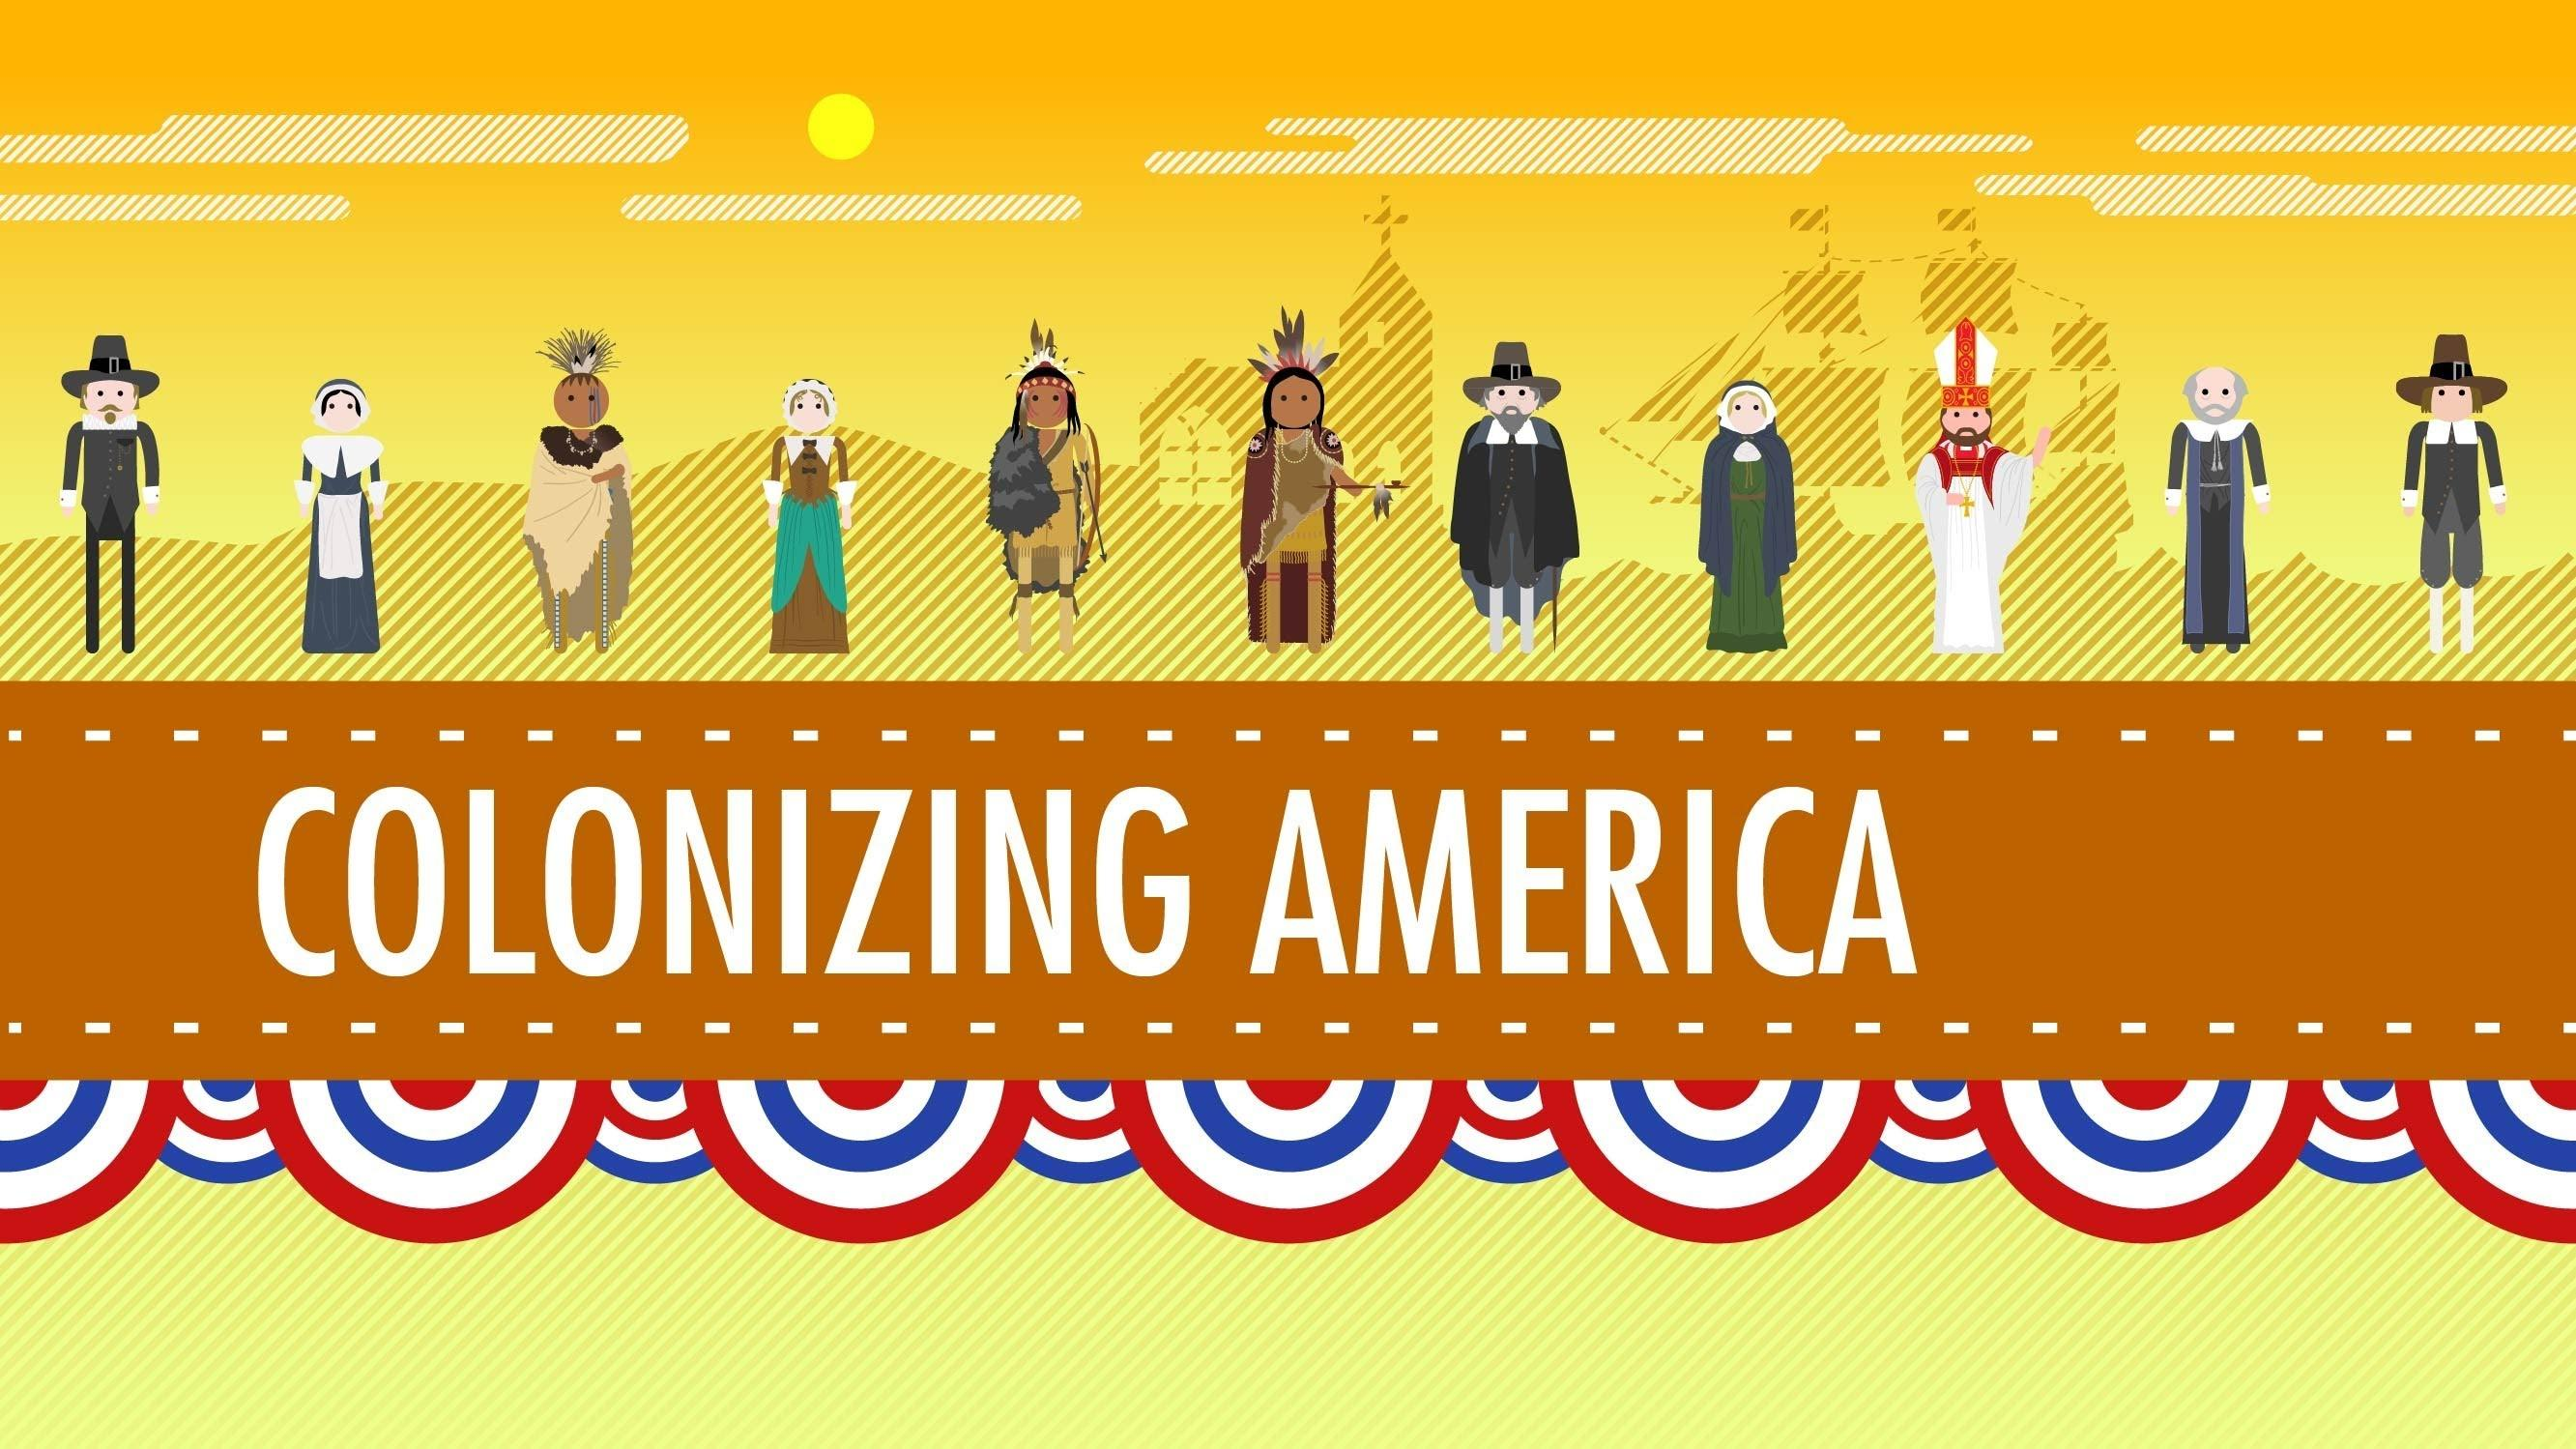 Colonizing America